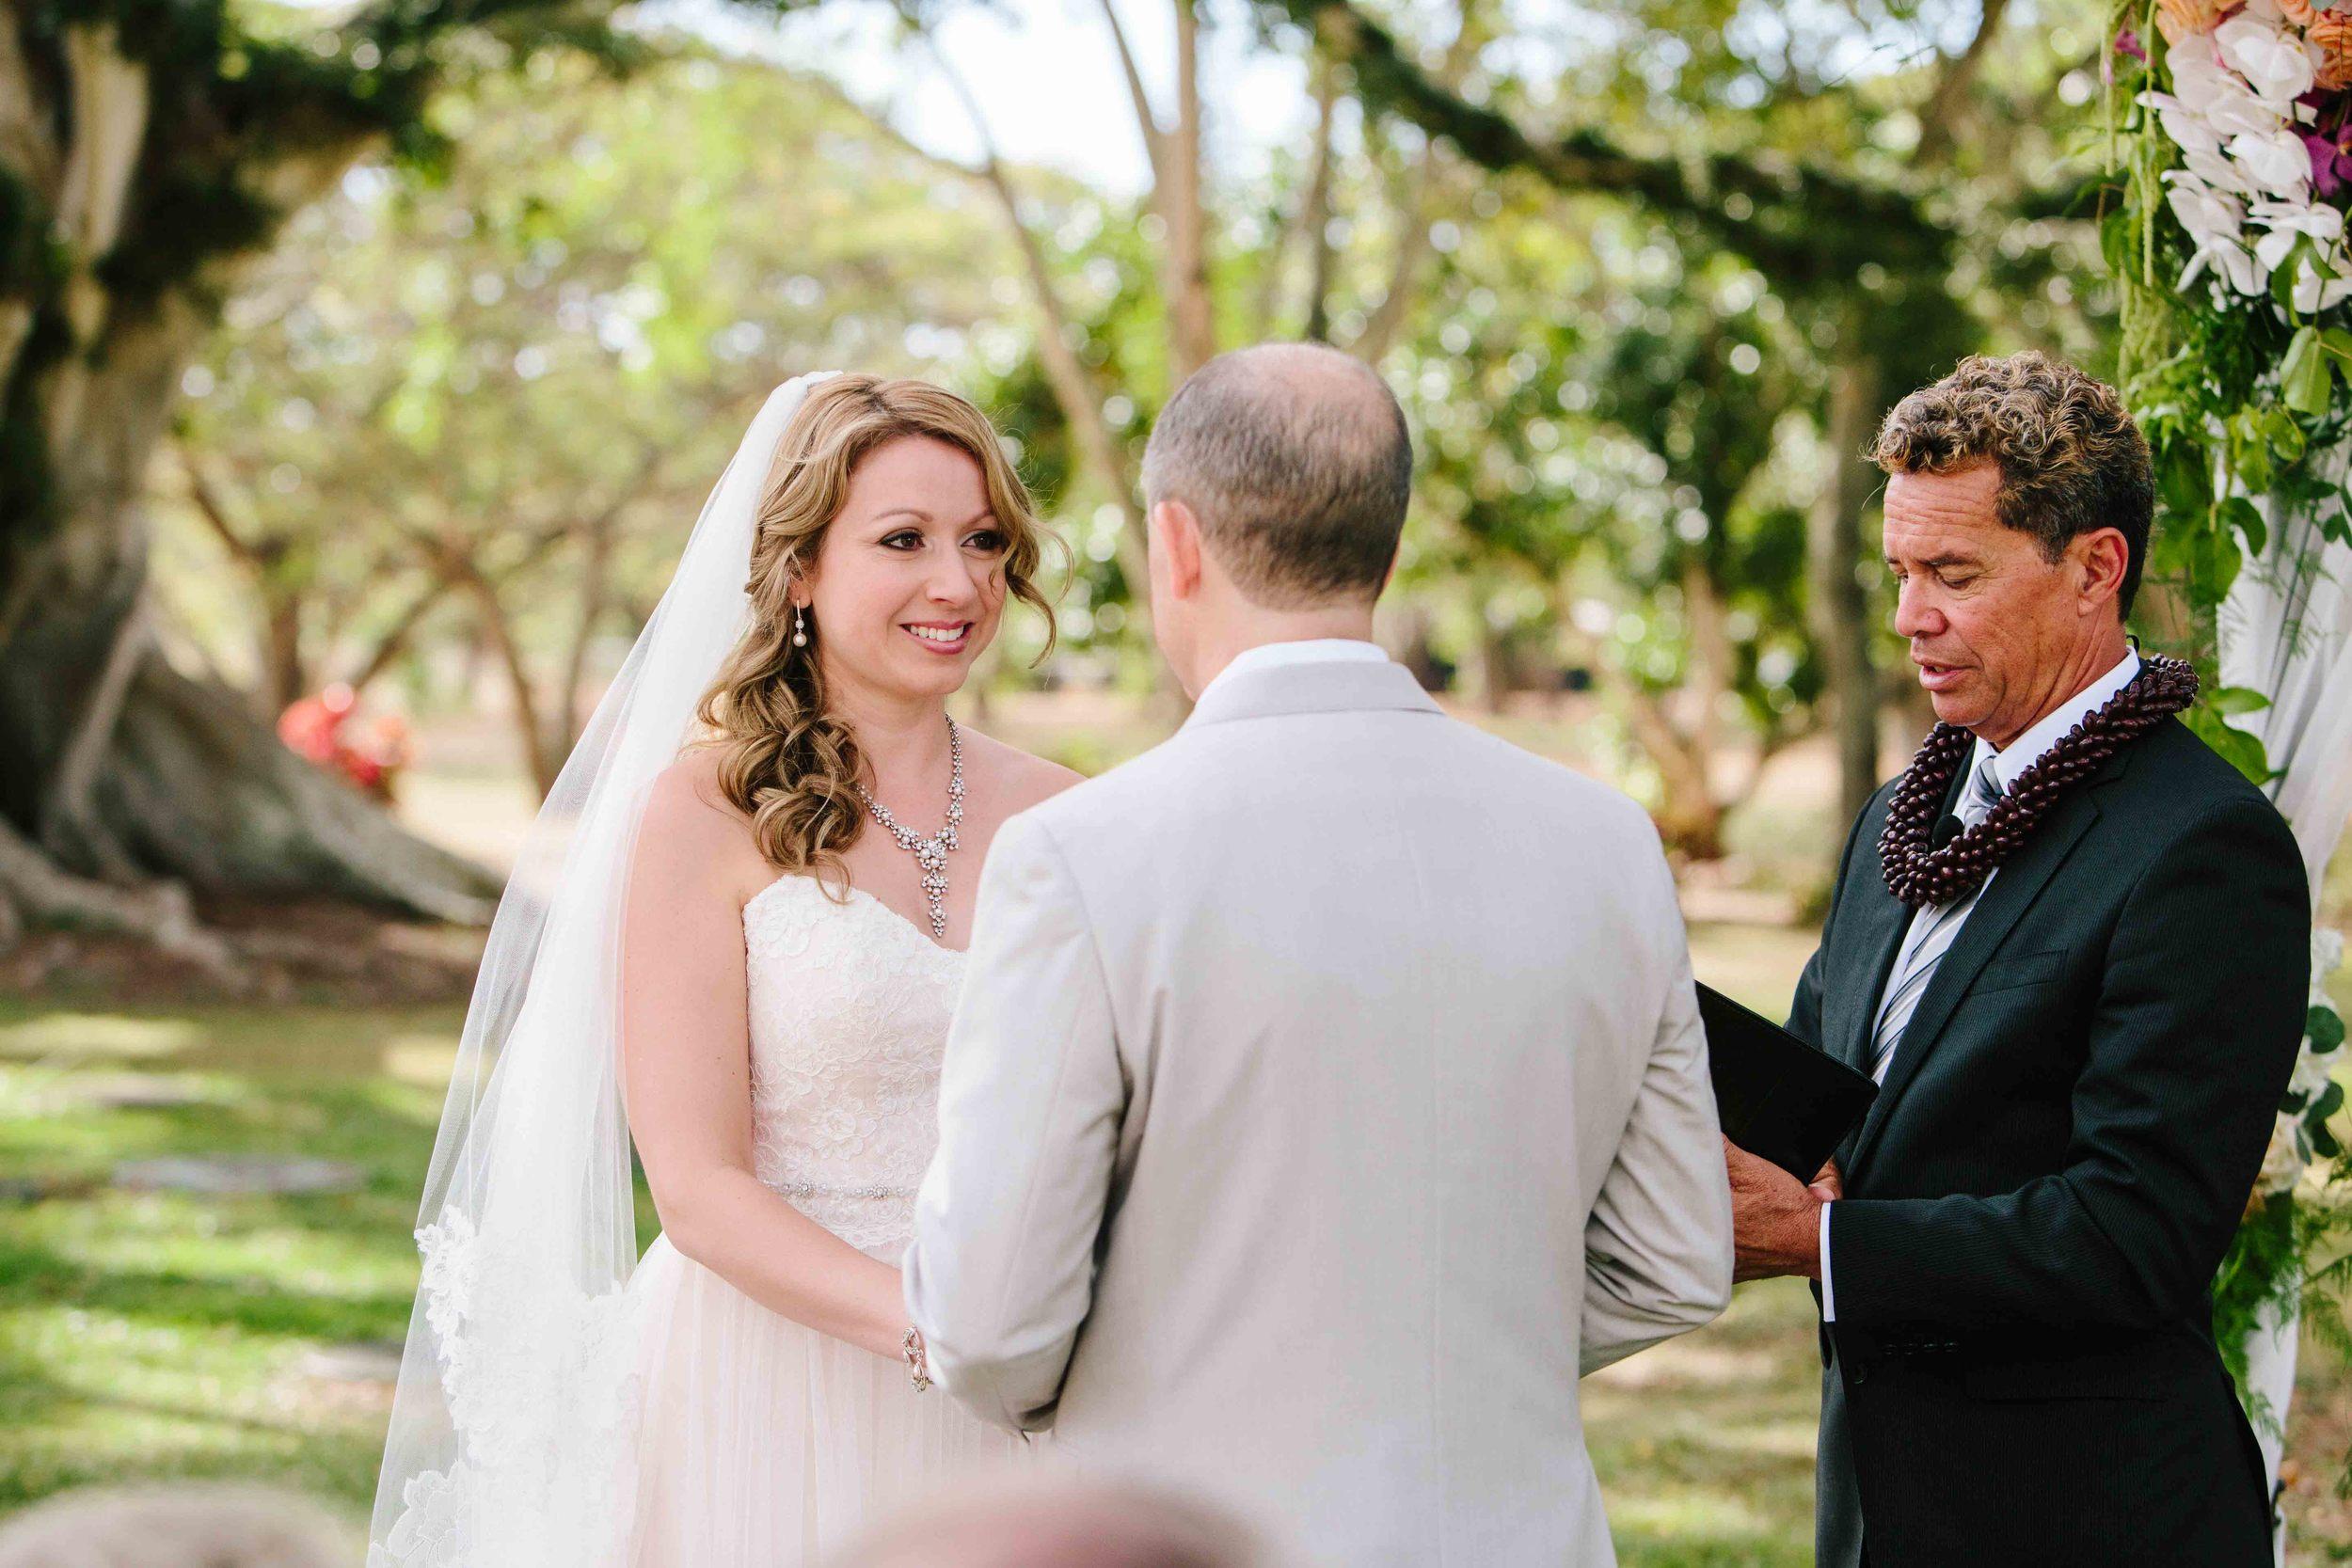 Bride at her Wedding Ceremony